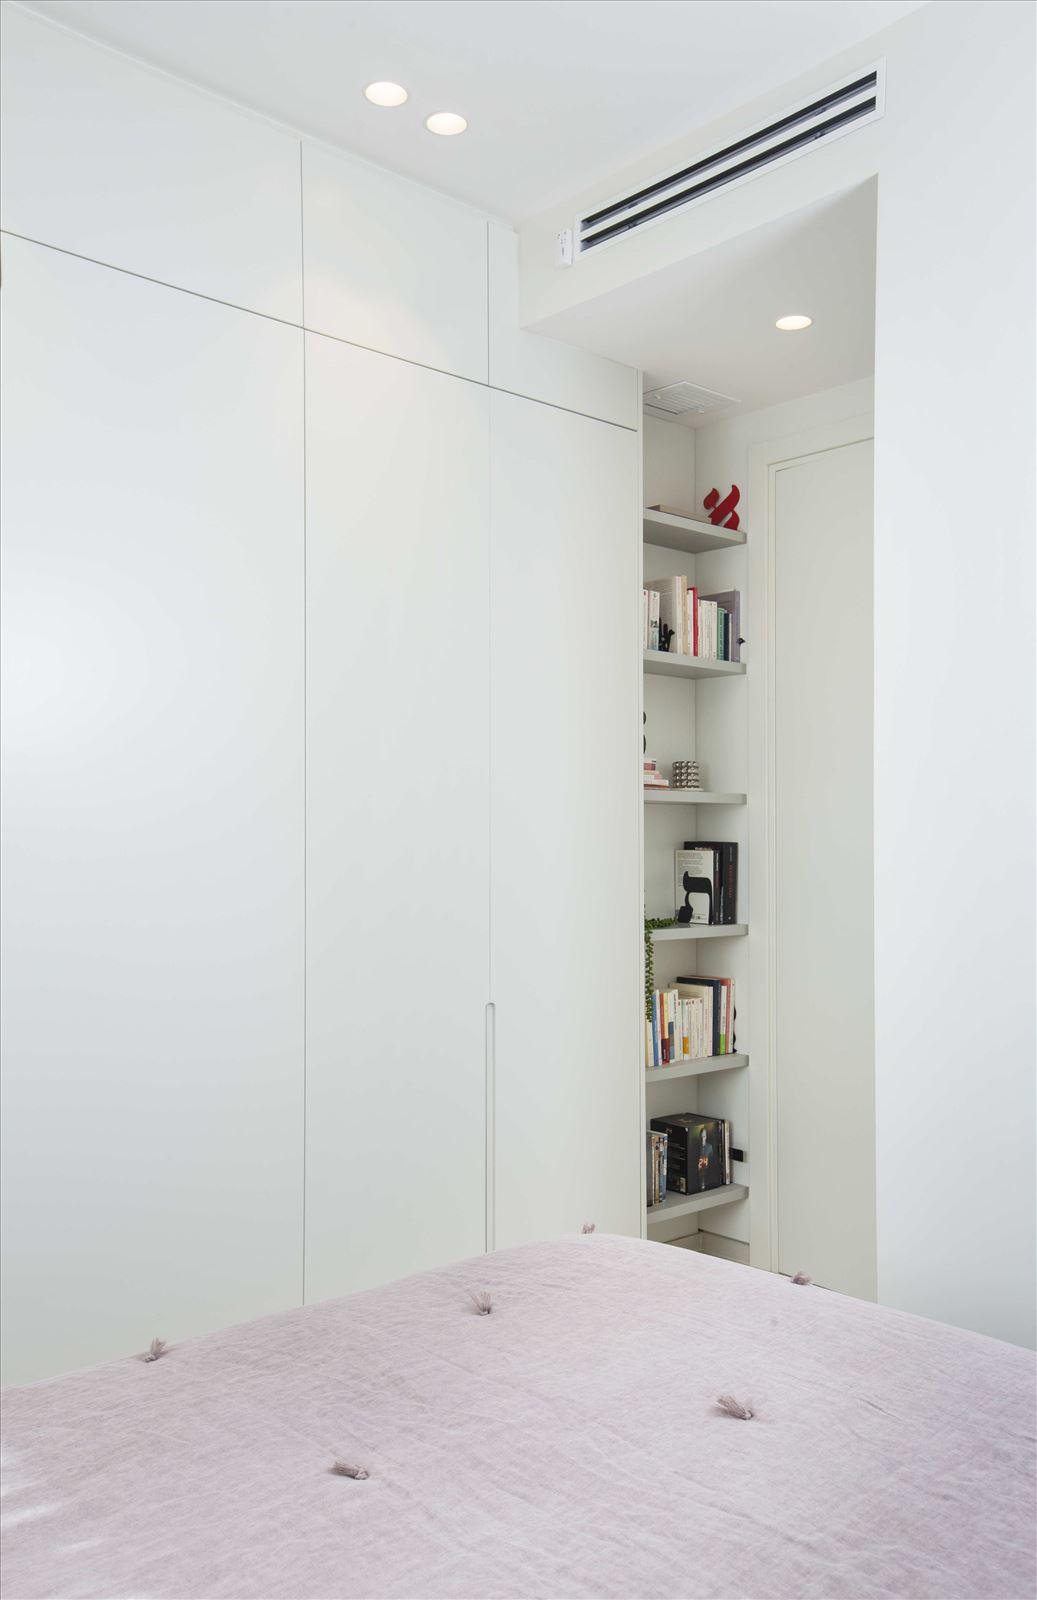 Tel Aviv apartment in Parisian aroma תאורת תקרה בחדר על ידי דורי קמחי